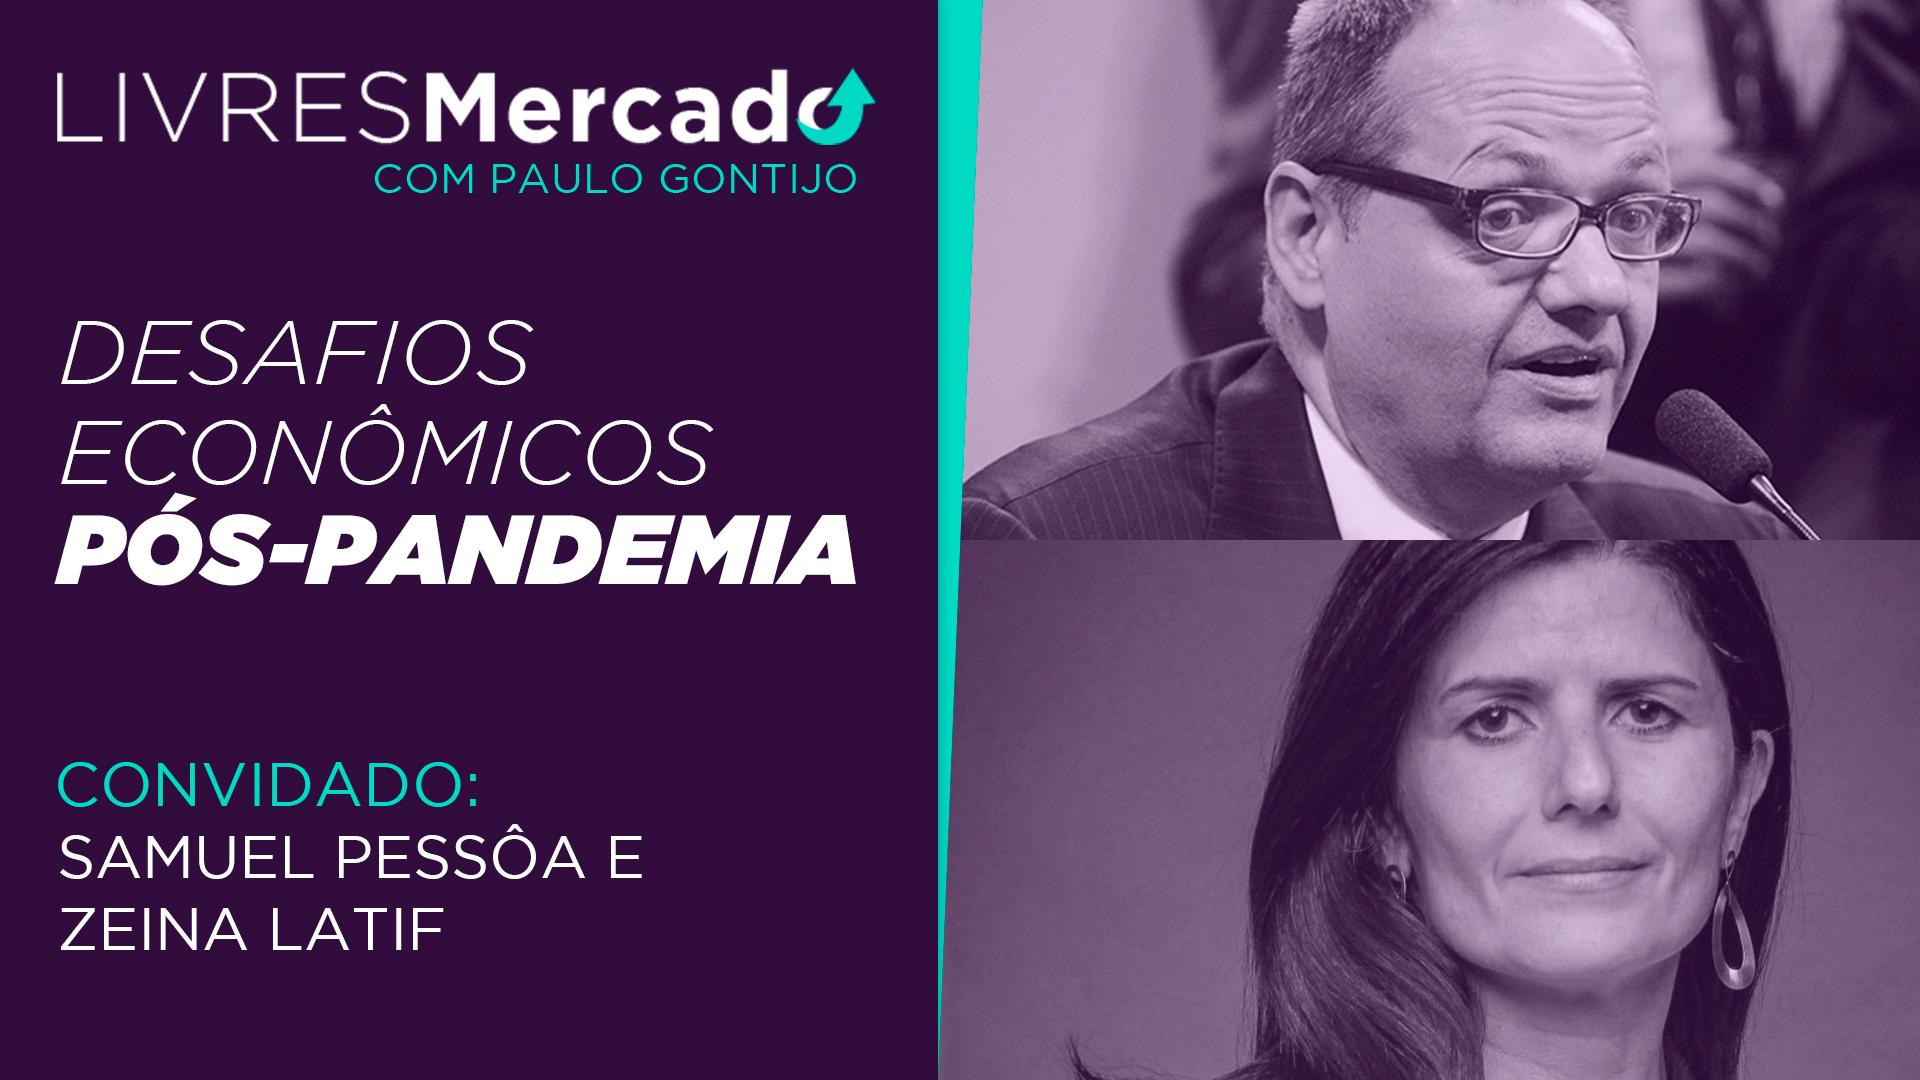 Samuel Pessôa e Zeina Latif: Desafios Econômicos Pós-pandemia